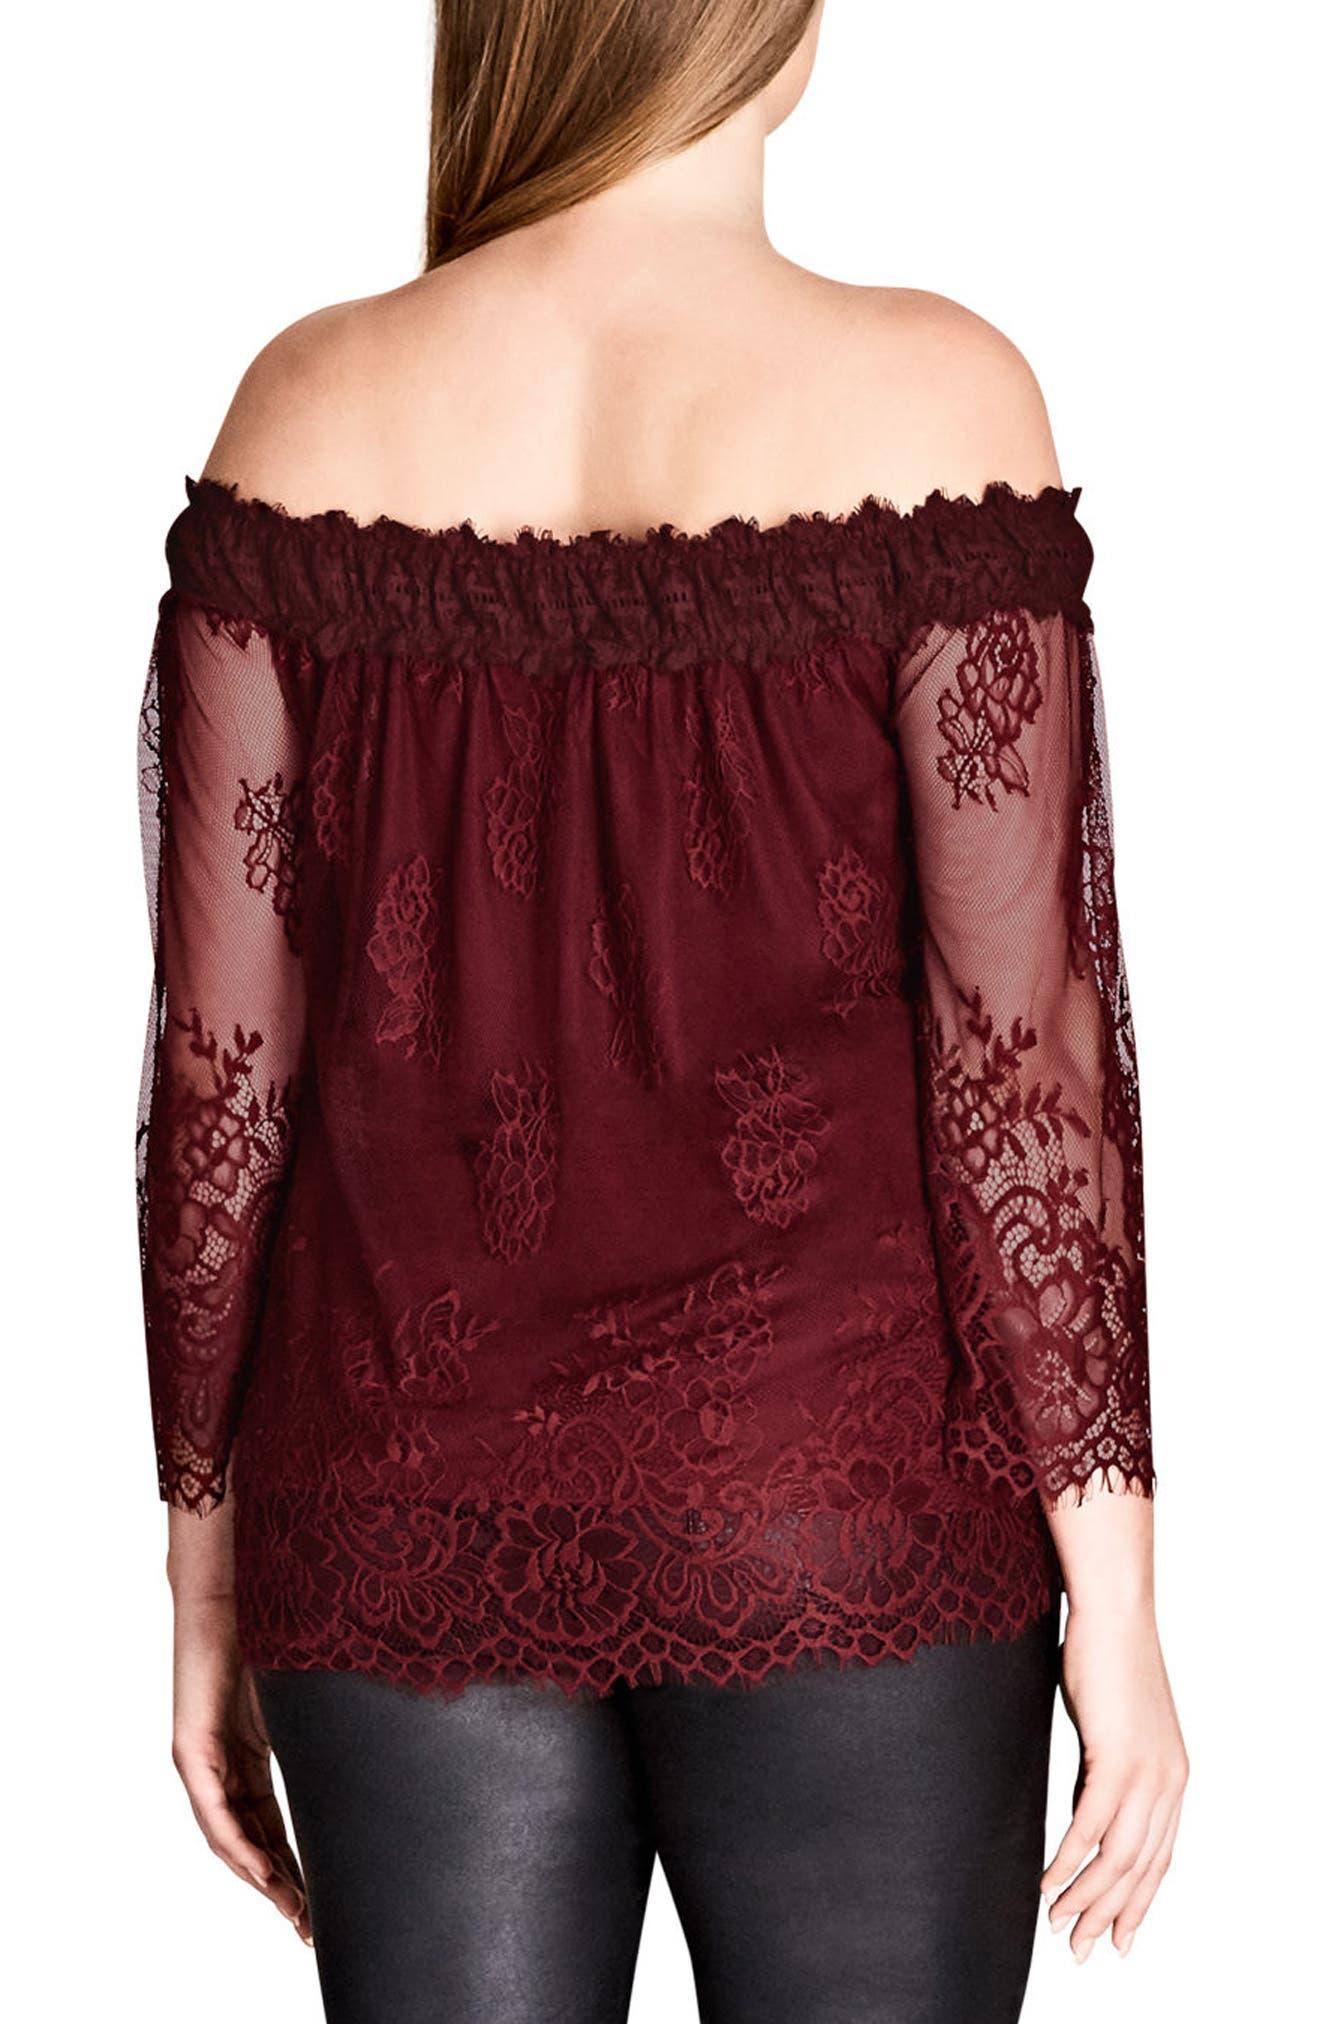 Alternate Image 2  - City Chic Soft Lace Off the Shoulder Top (Plus Size)